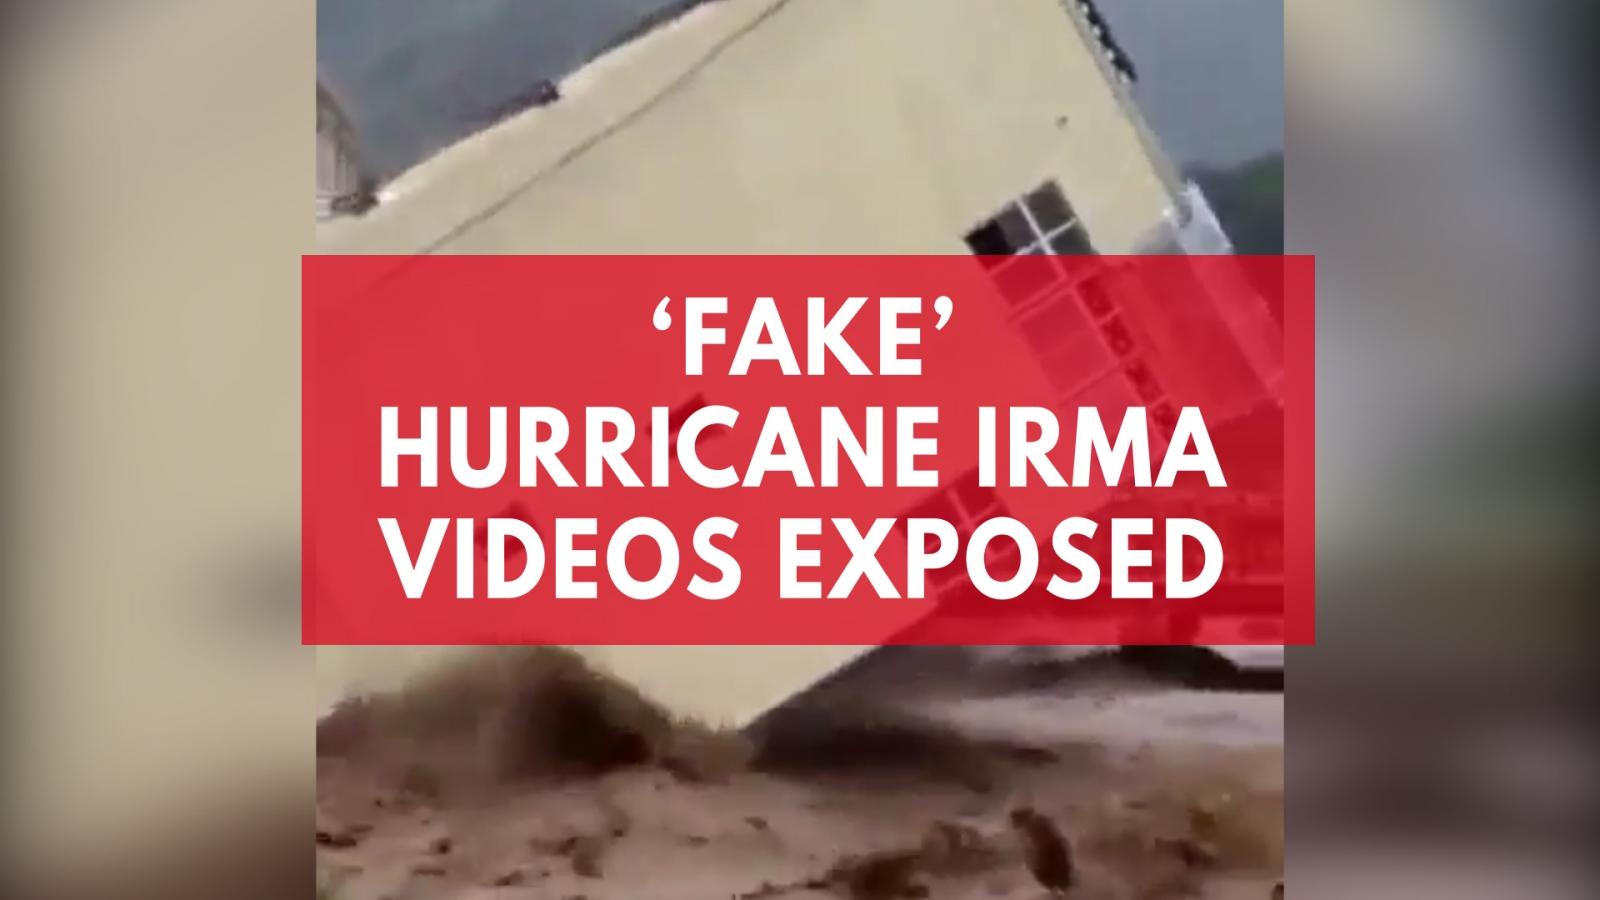 fake-hurricane-irma-videos-widely-shared-on-social-media